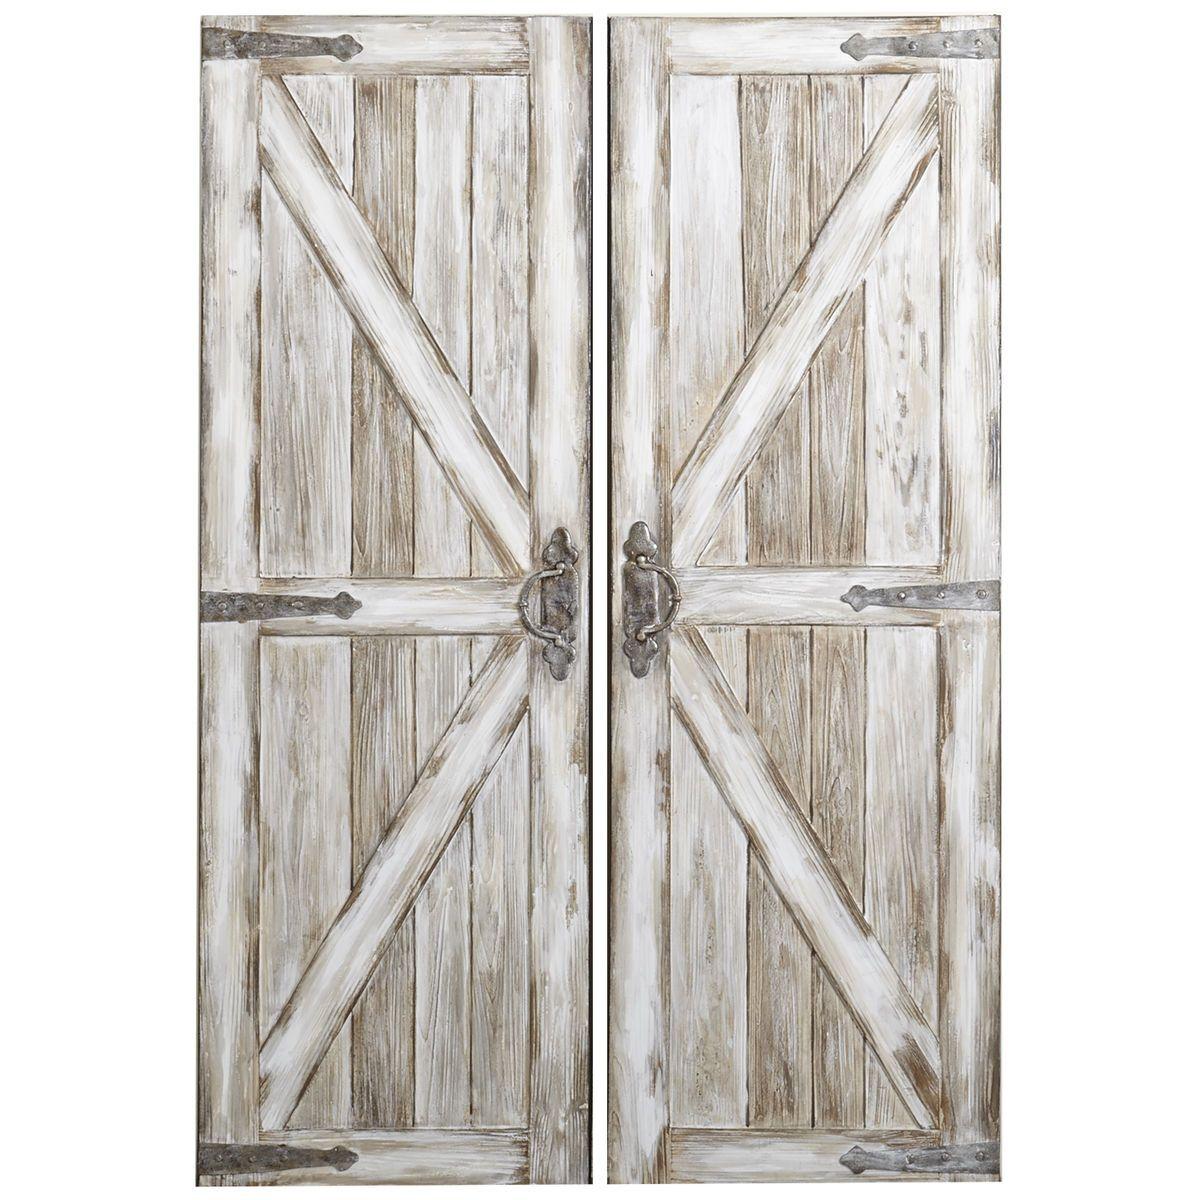 Antique White Rustic Barn Doors Art Pier 1 Imports Rustic Barn Door Rustic Doors Wood Doors Interior